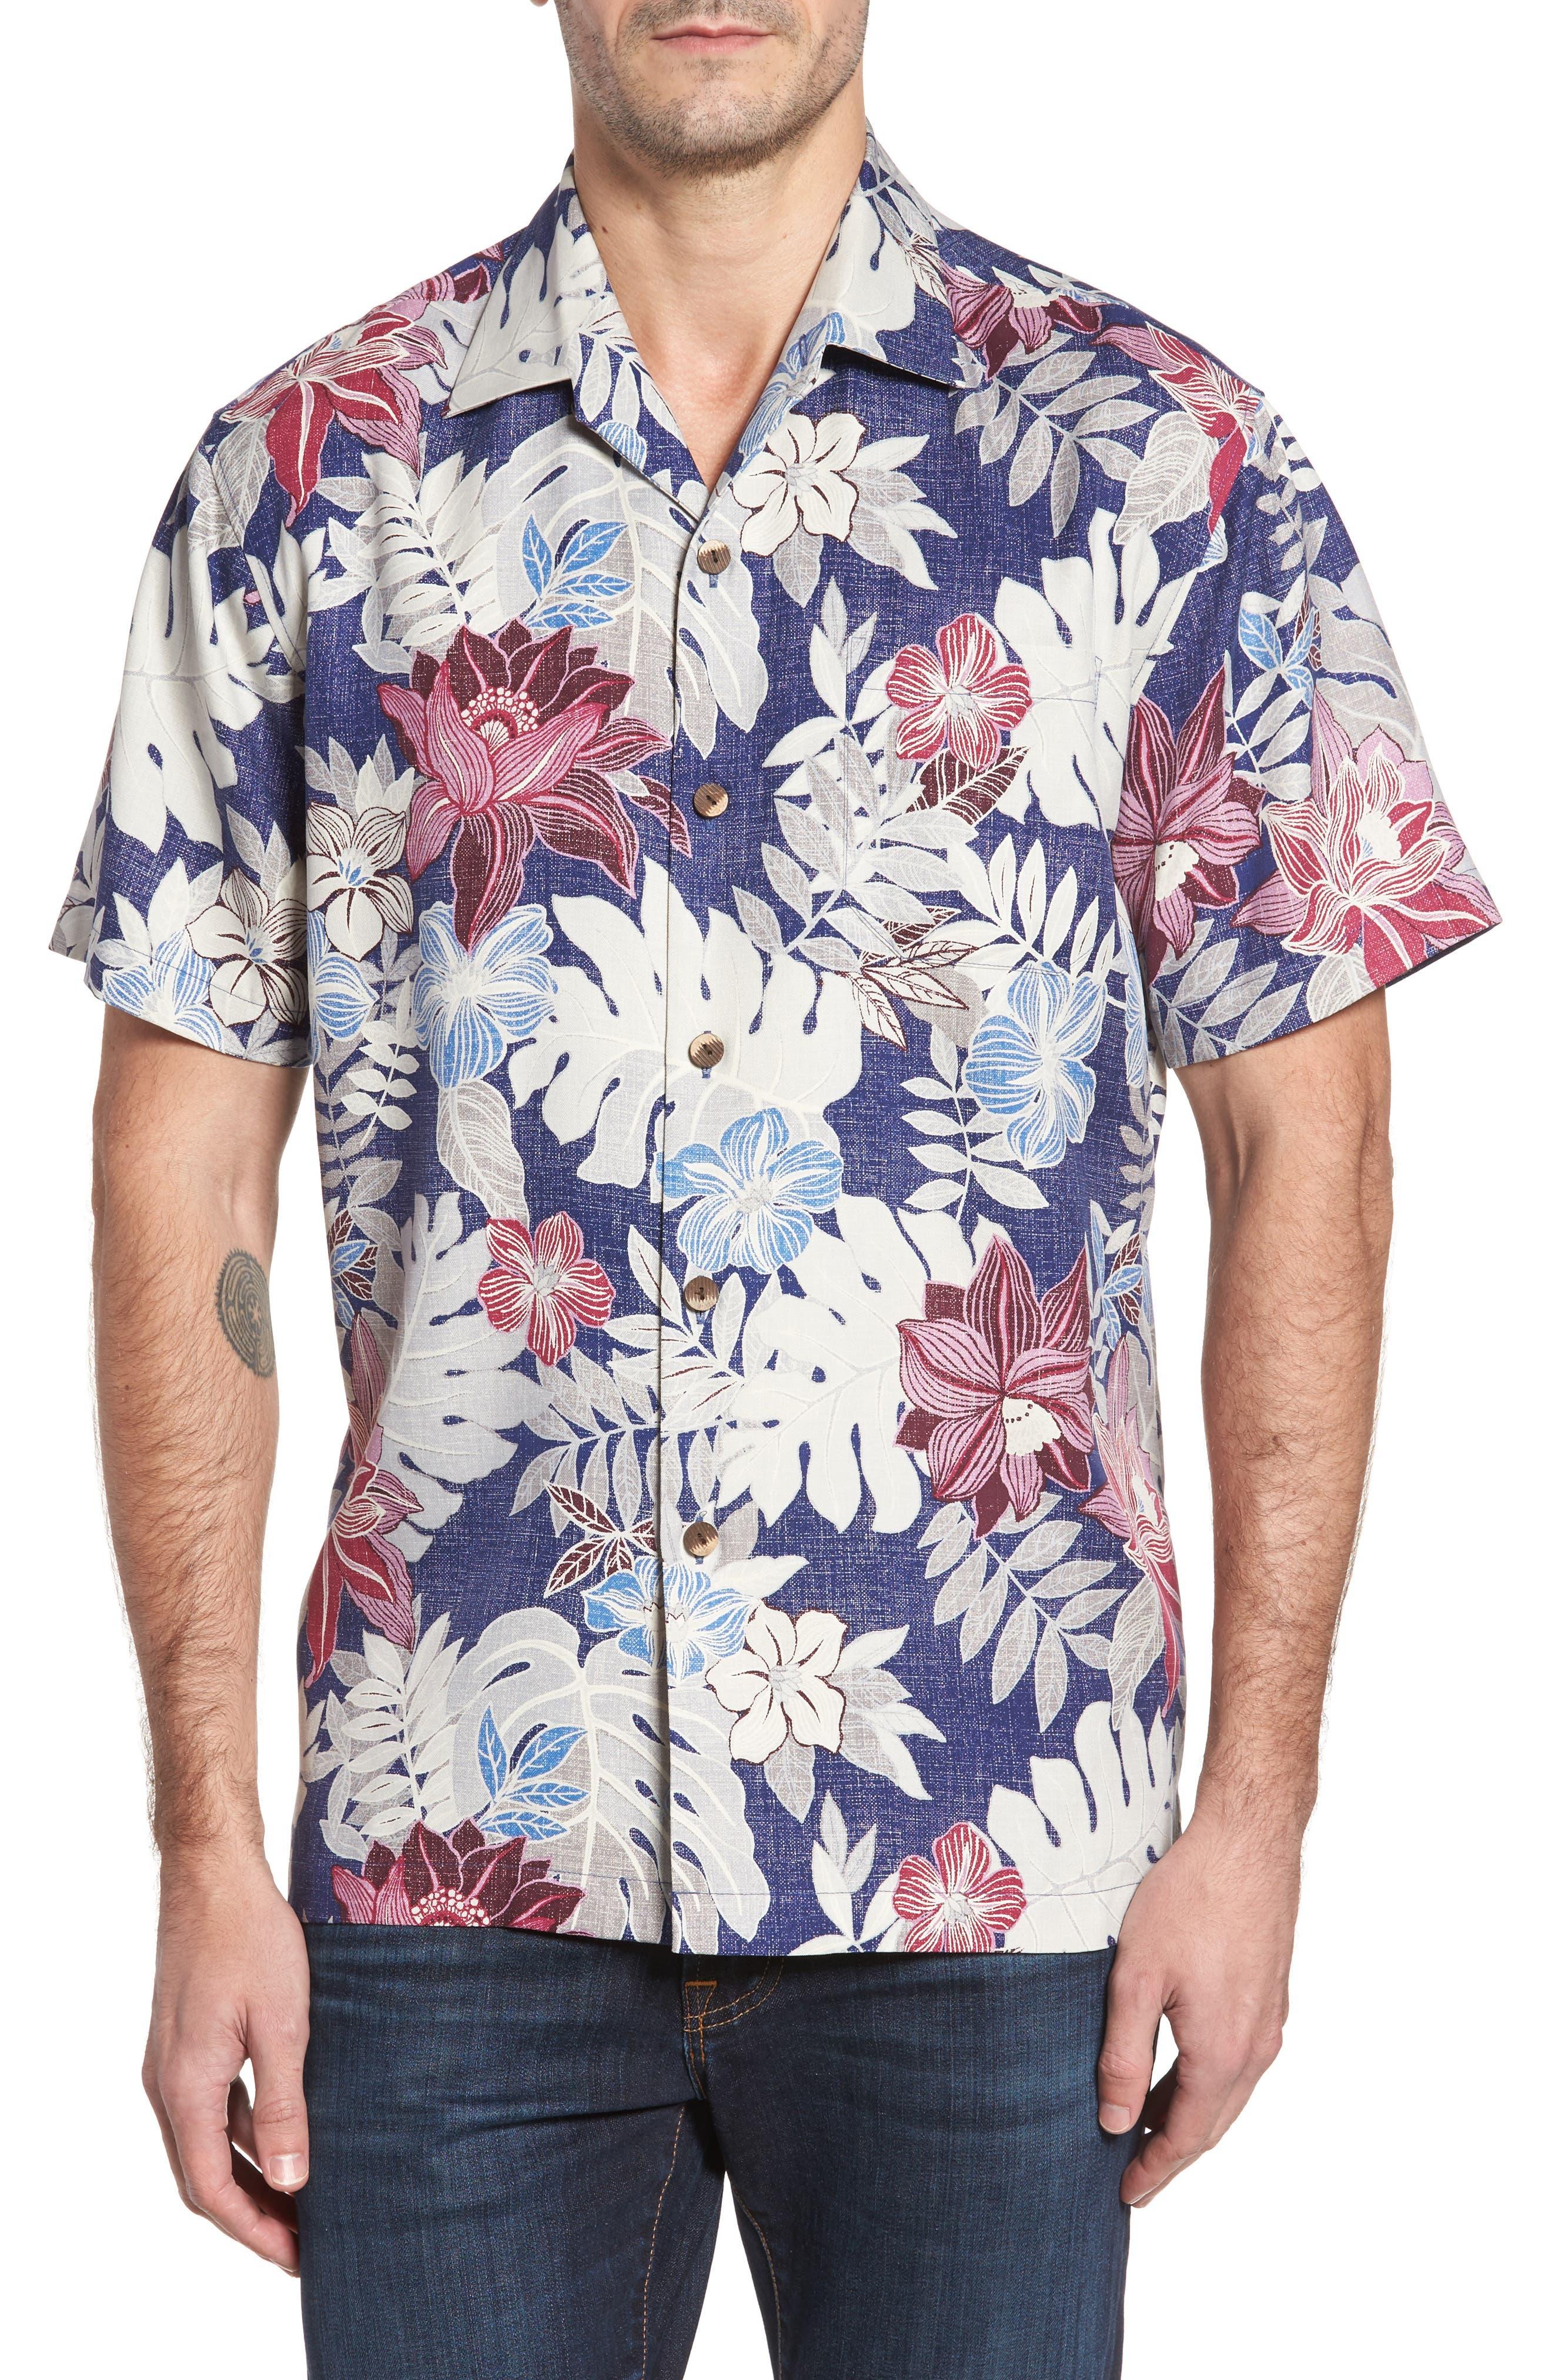 Alternate Image 1 Selected - Tommy Bahama Desert Blooms Original Fit Print Silk Camp Shirt